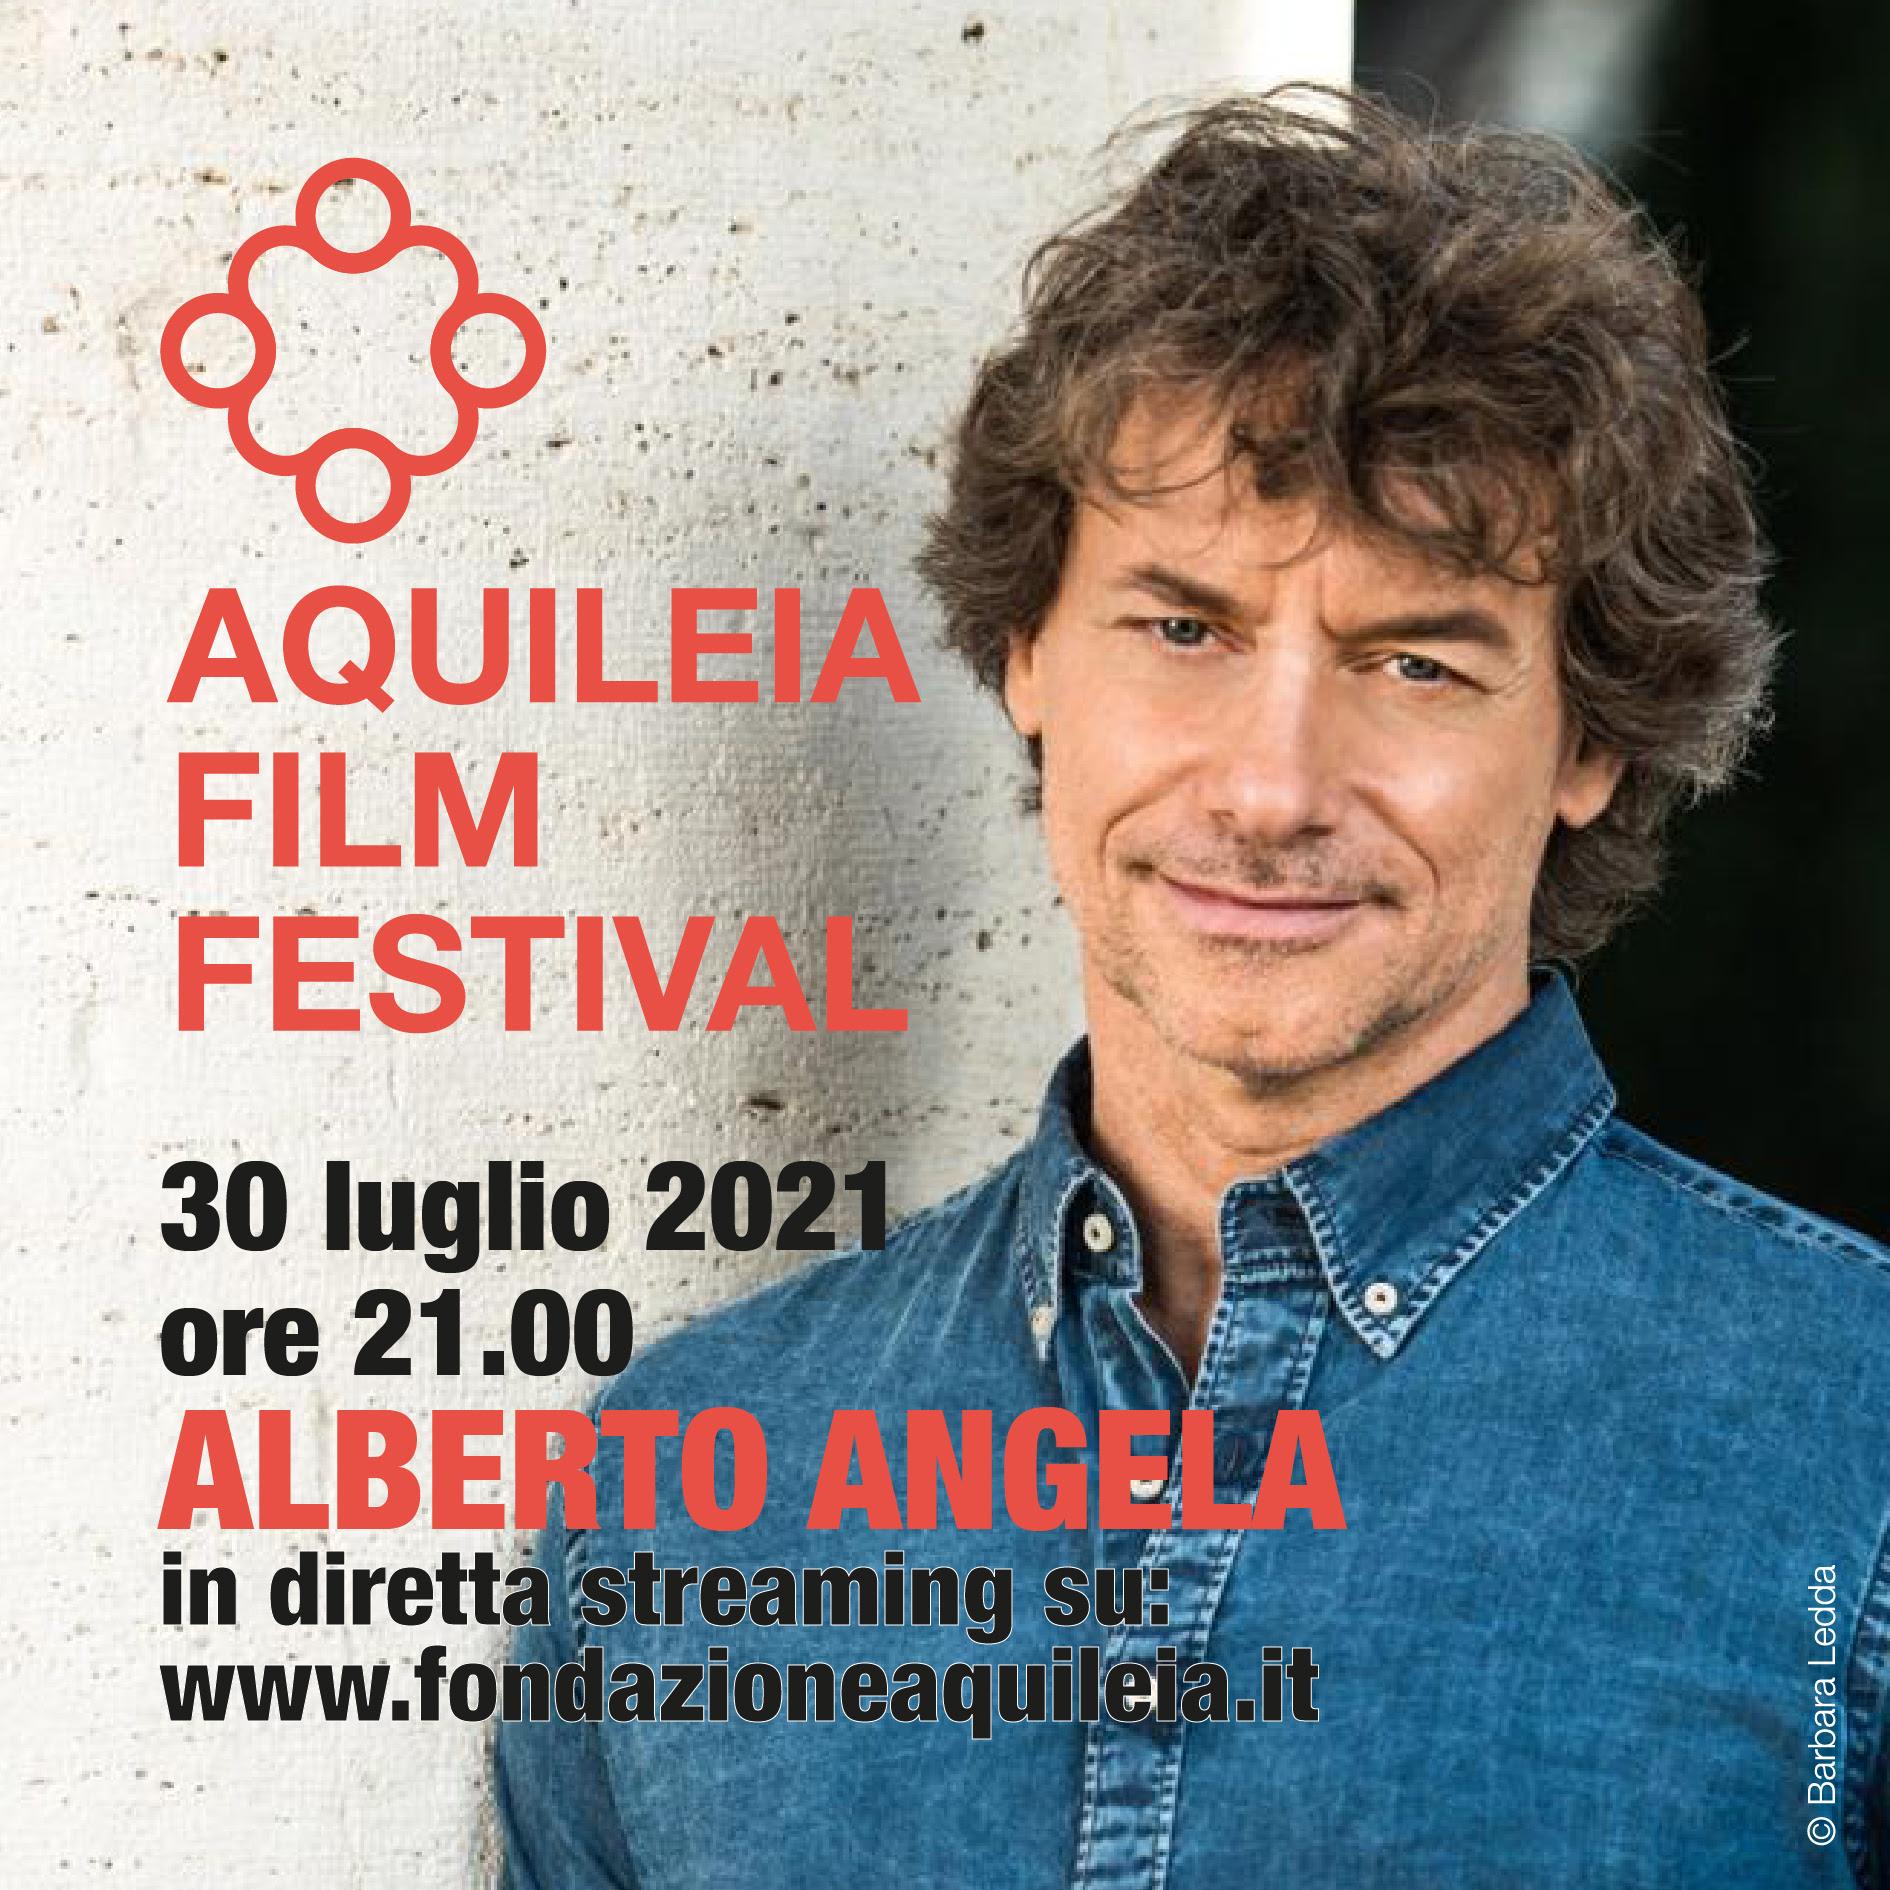 aquileia_film-fest_serata-alberto-angela_foto-fondazione-aquileia